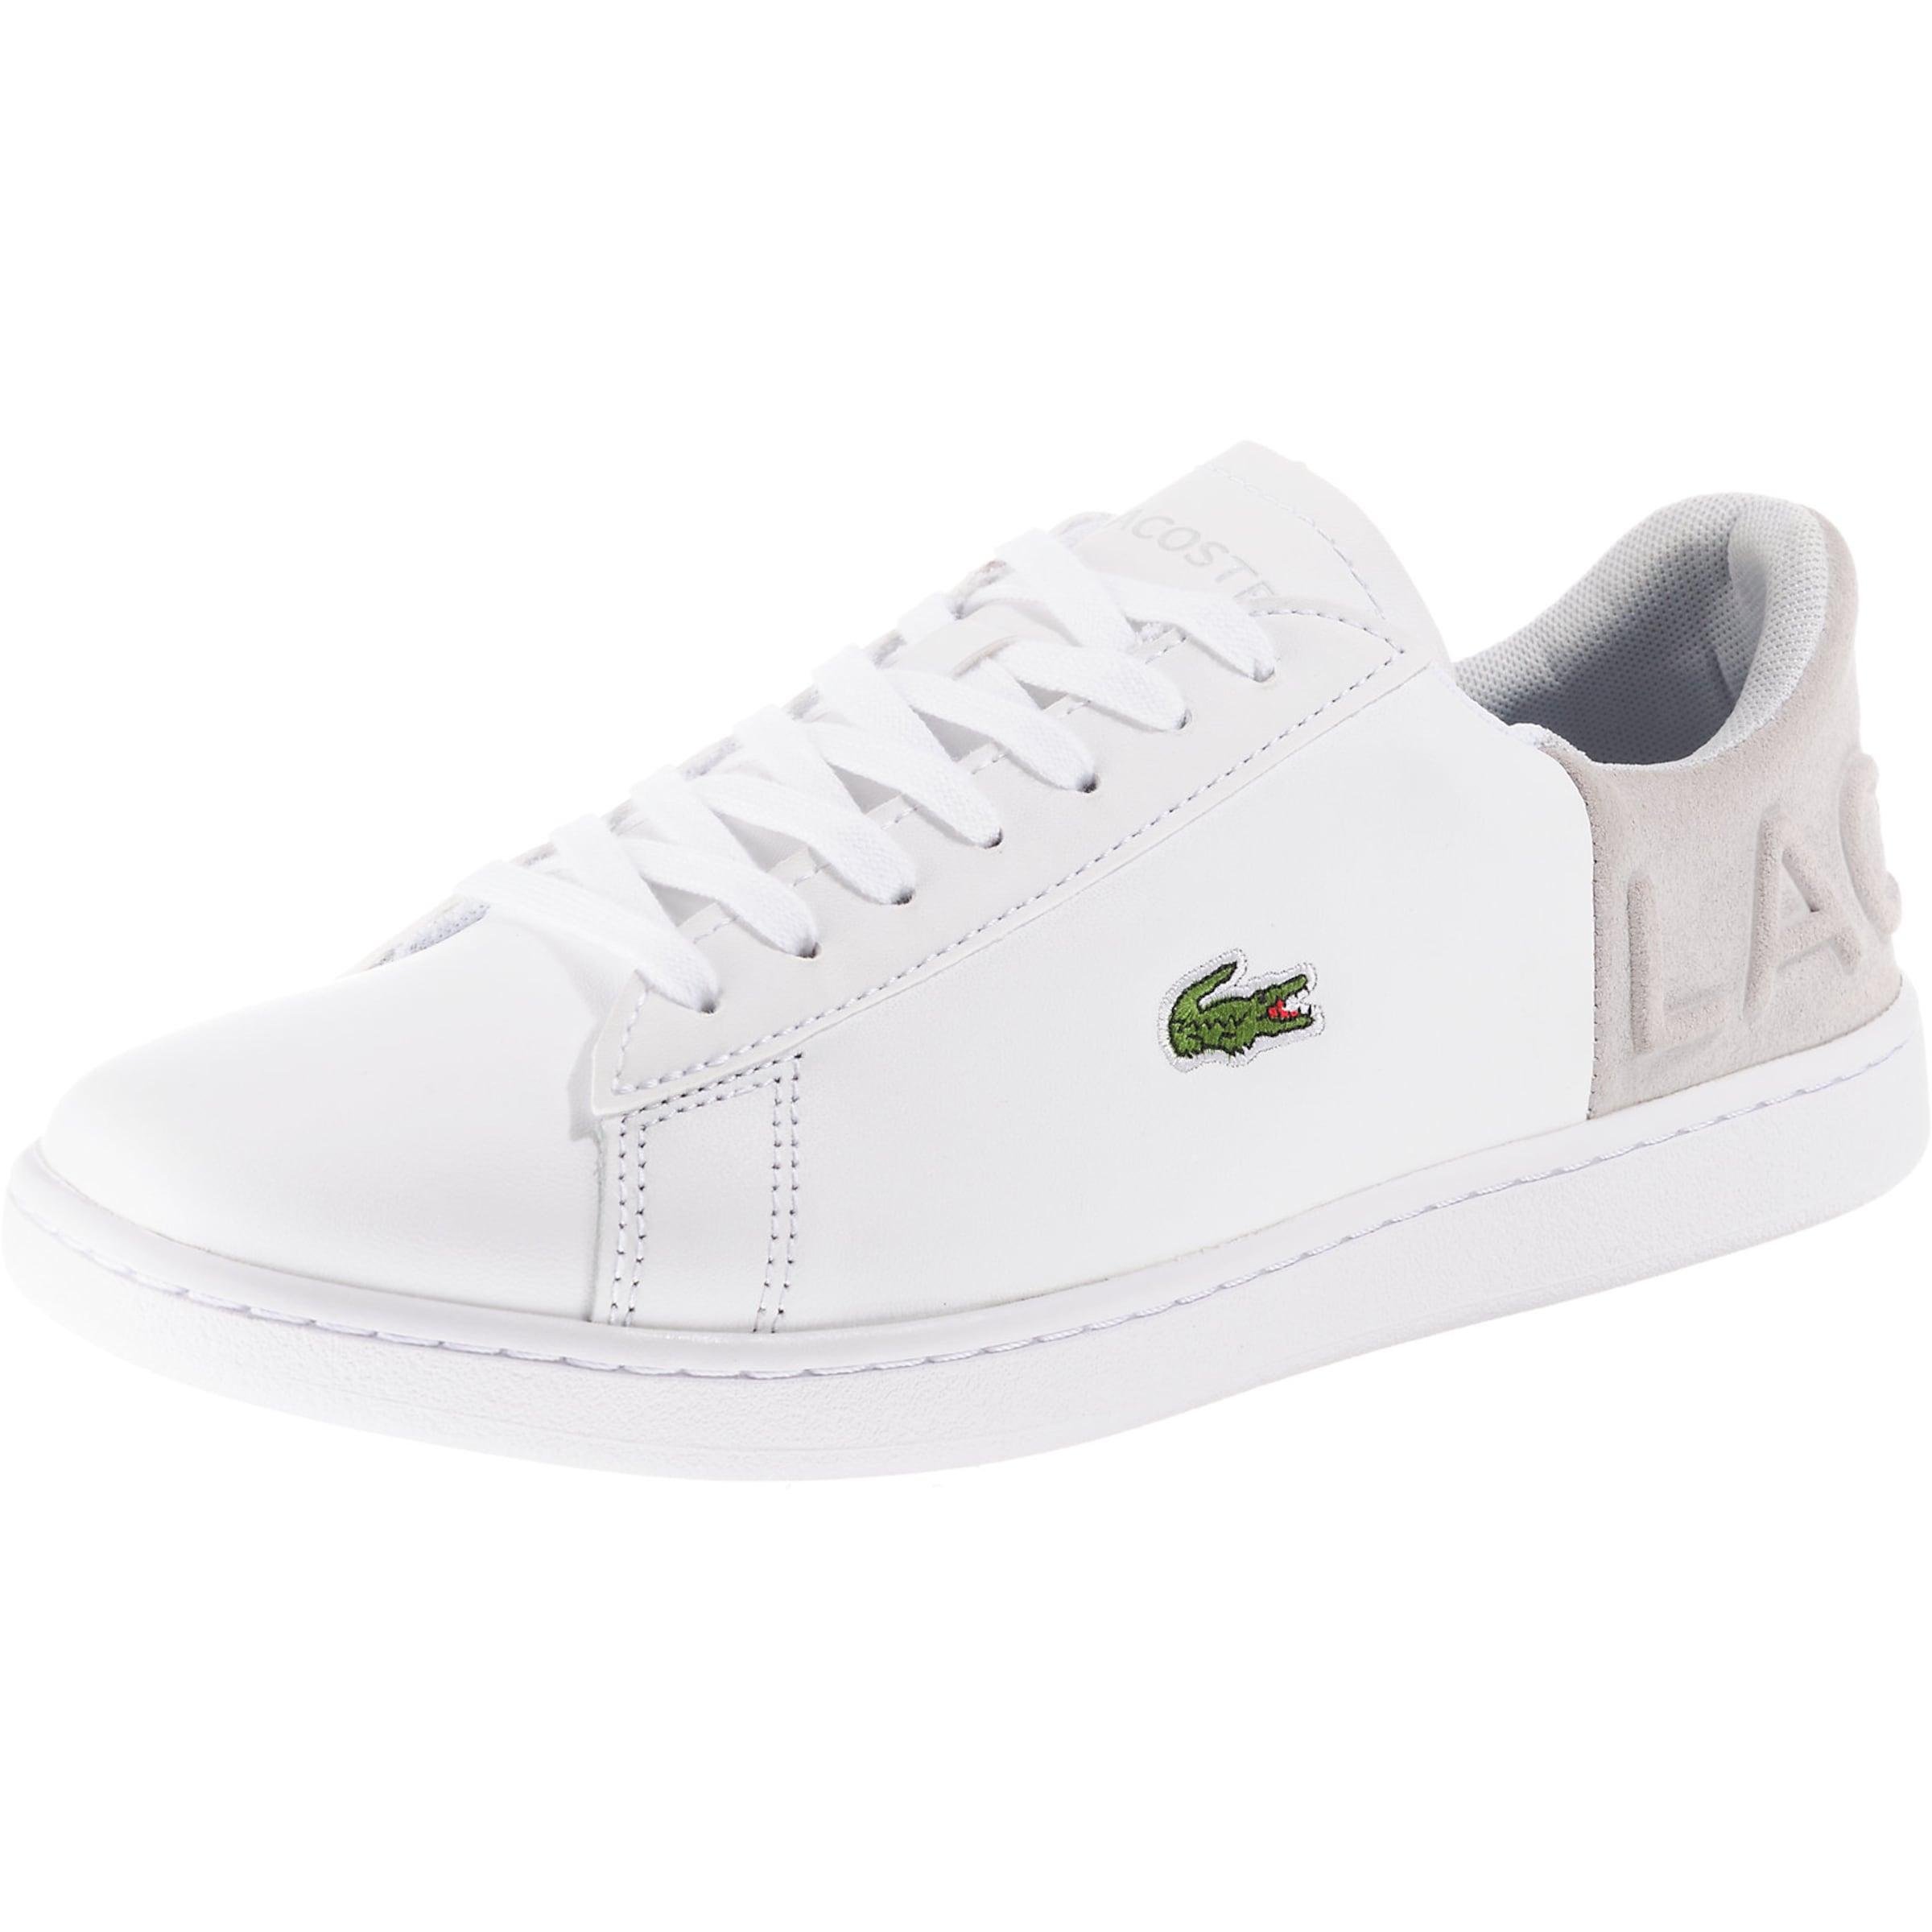 LACOSTE Carnaby Evo Sneakers Verschleißfeste billige Schuhe